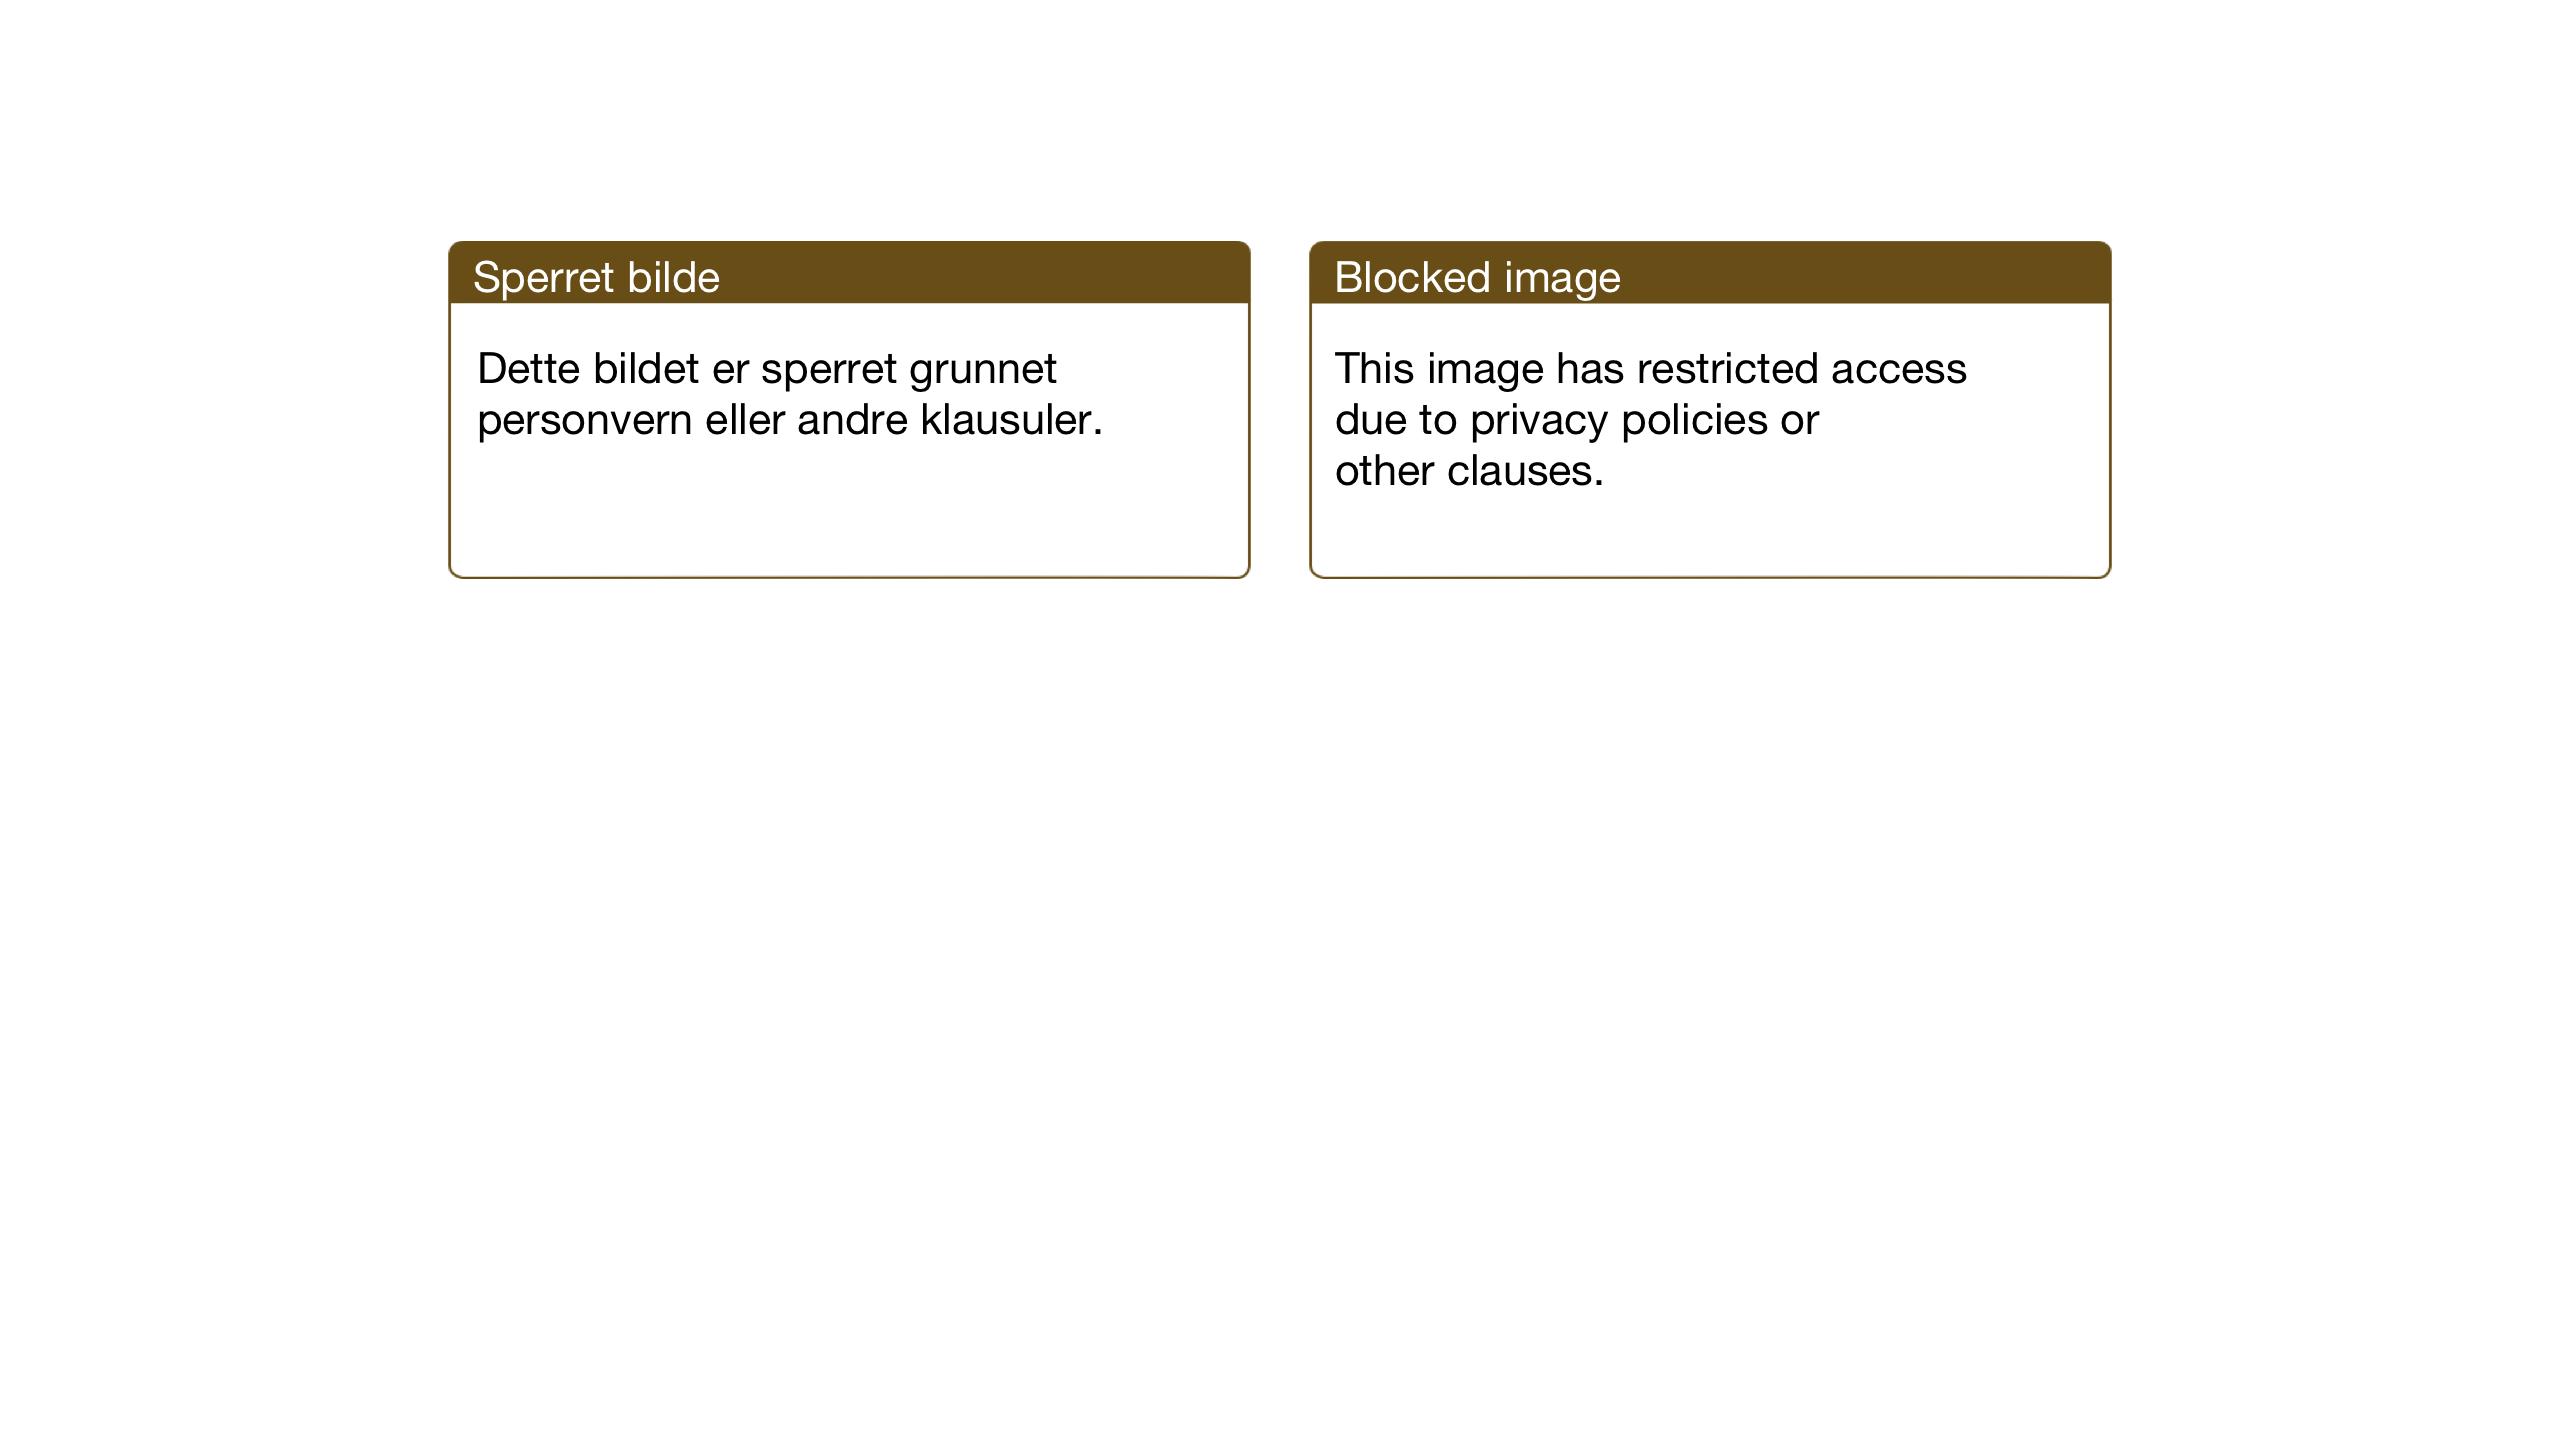 SAT, Ministerialprotokoller, klokkerbøker og fødselsregistre - Nordland, 847/L0680: Klokkerbok nr. 847C08, 1930-1947, s. 74